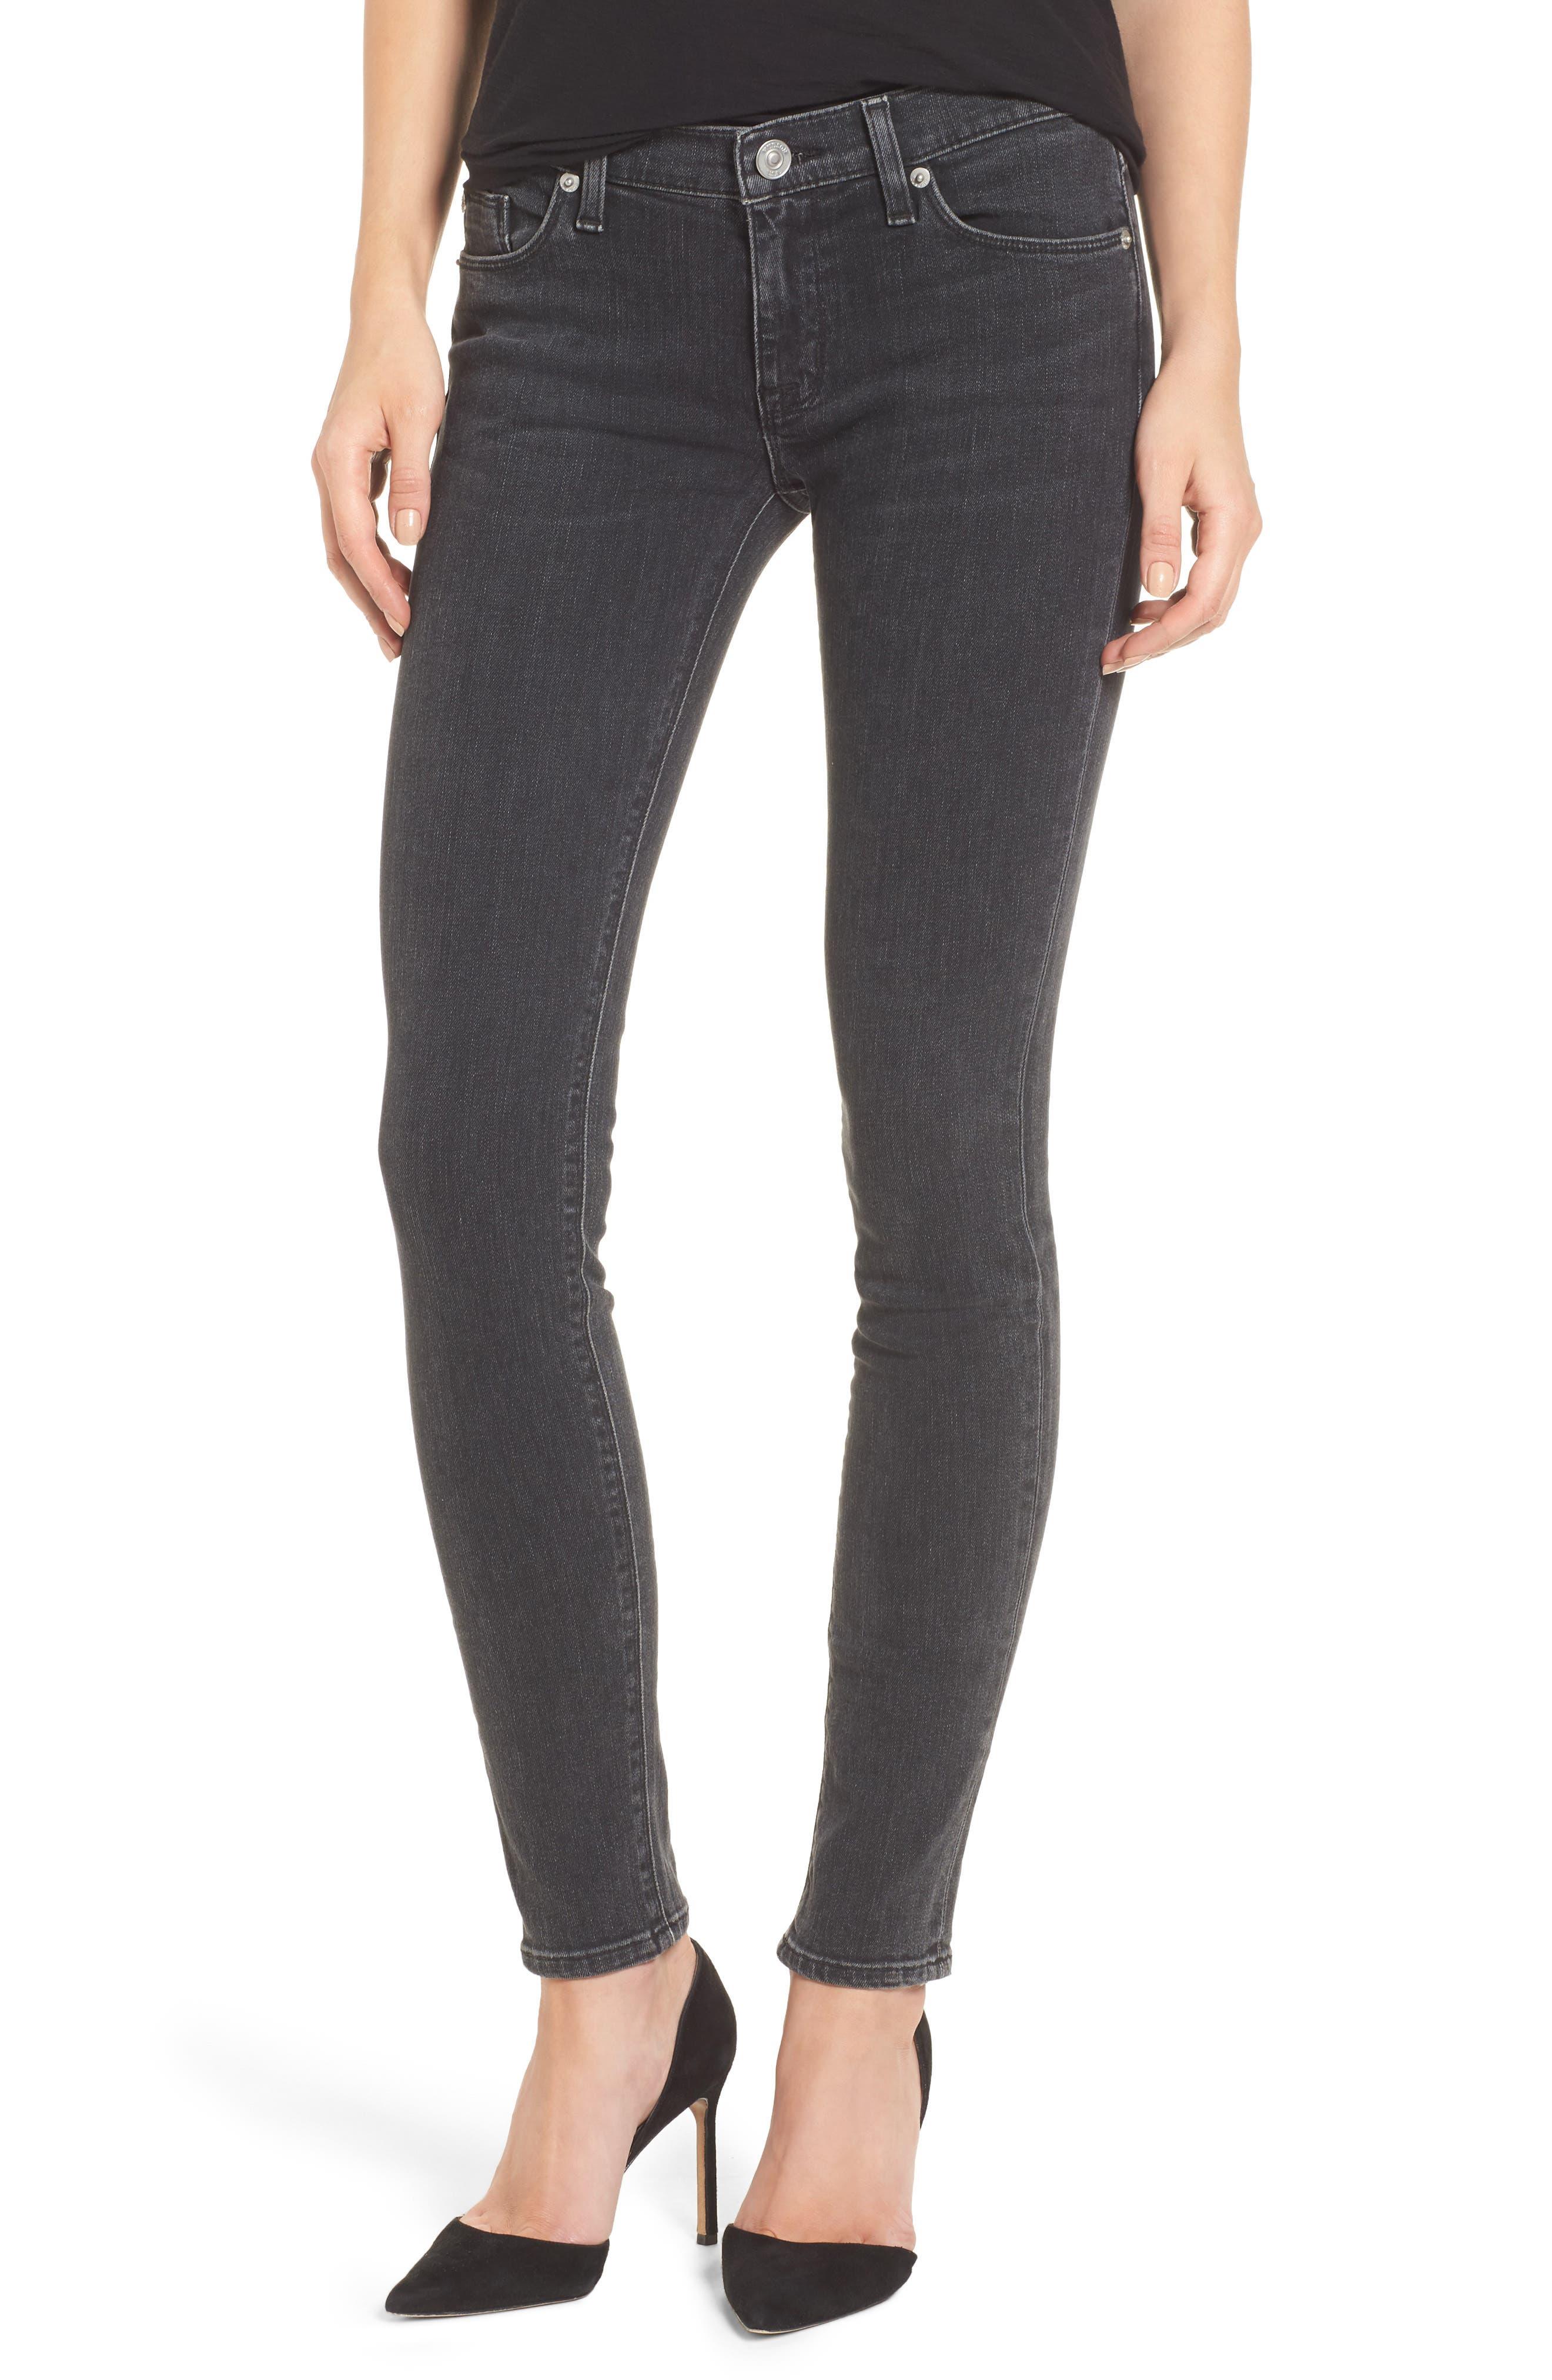 Krista Super Skinny Jeans,                         Main,                         color, 8Bit